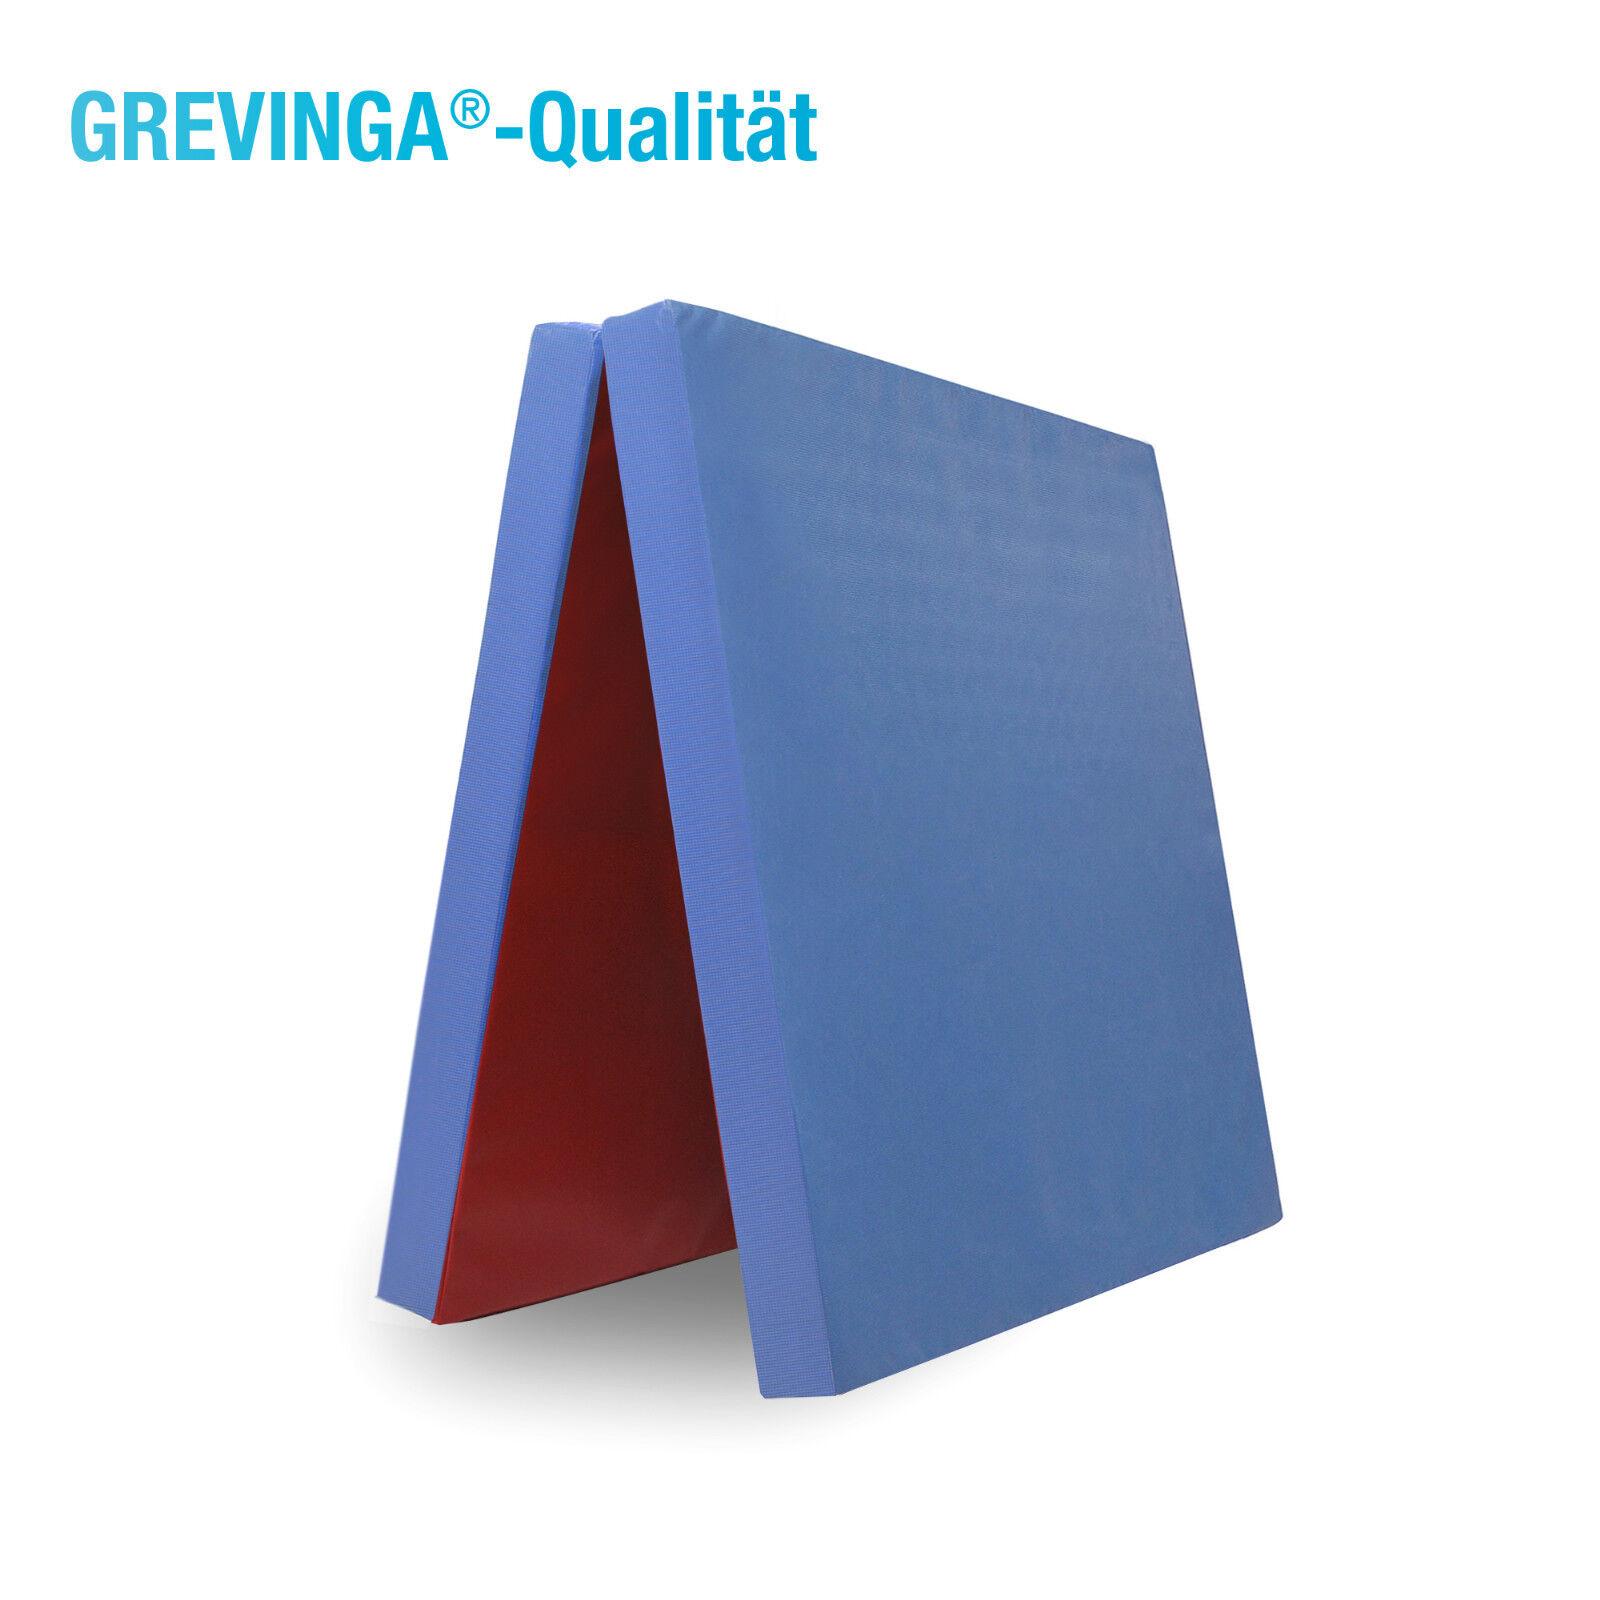 Grevinga® RESTPOSTEN klappbare Turnmatte ca. 200 x 100 x 8 cm in rot - RG 35